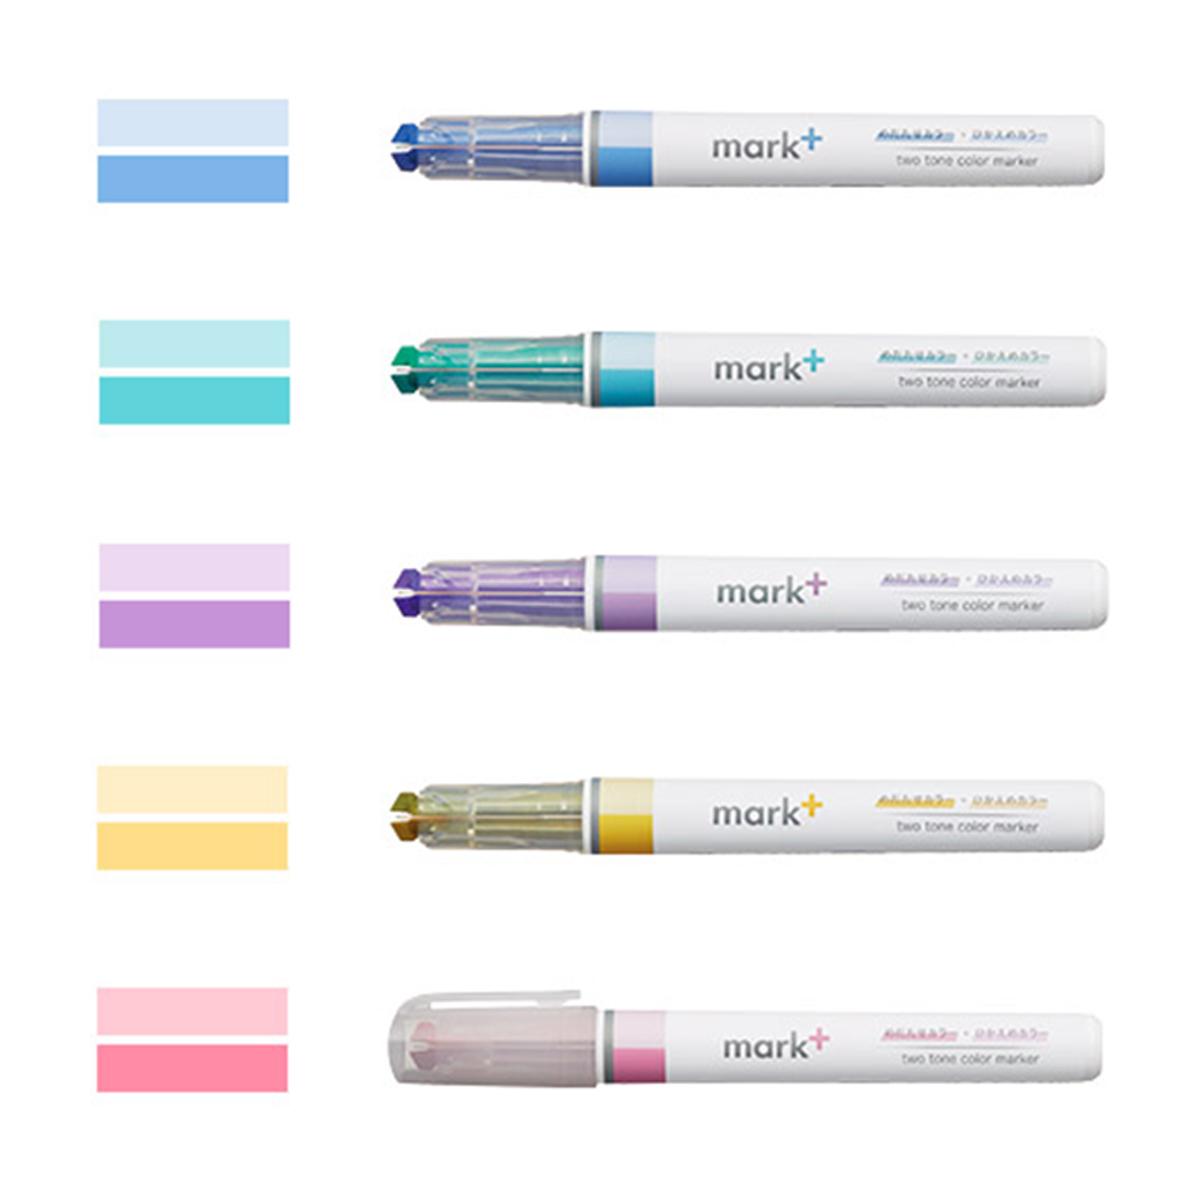 Kokuyo Mark+ Subrayadores Pastel Color Marker Pen